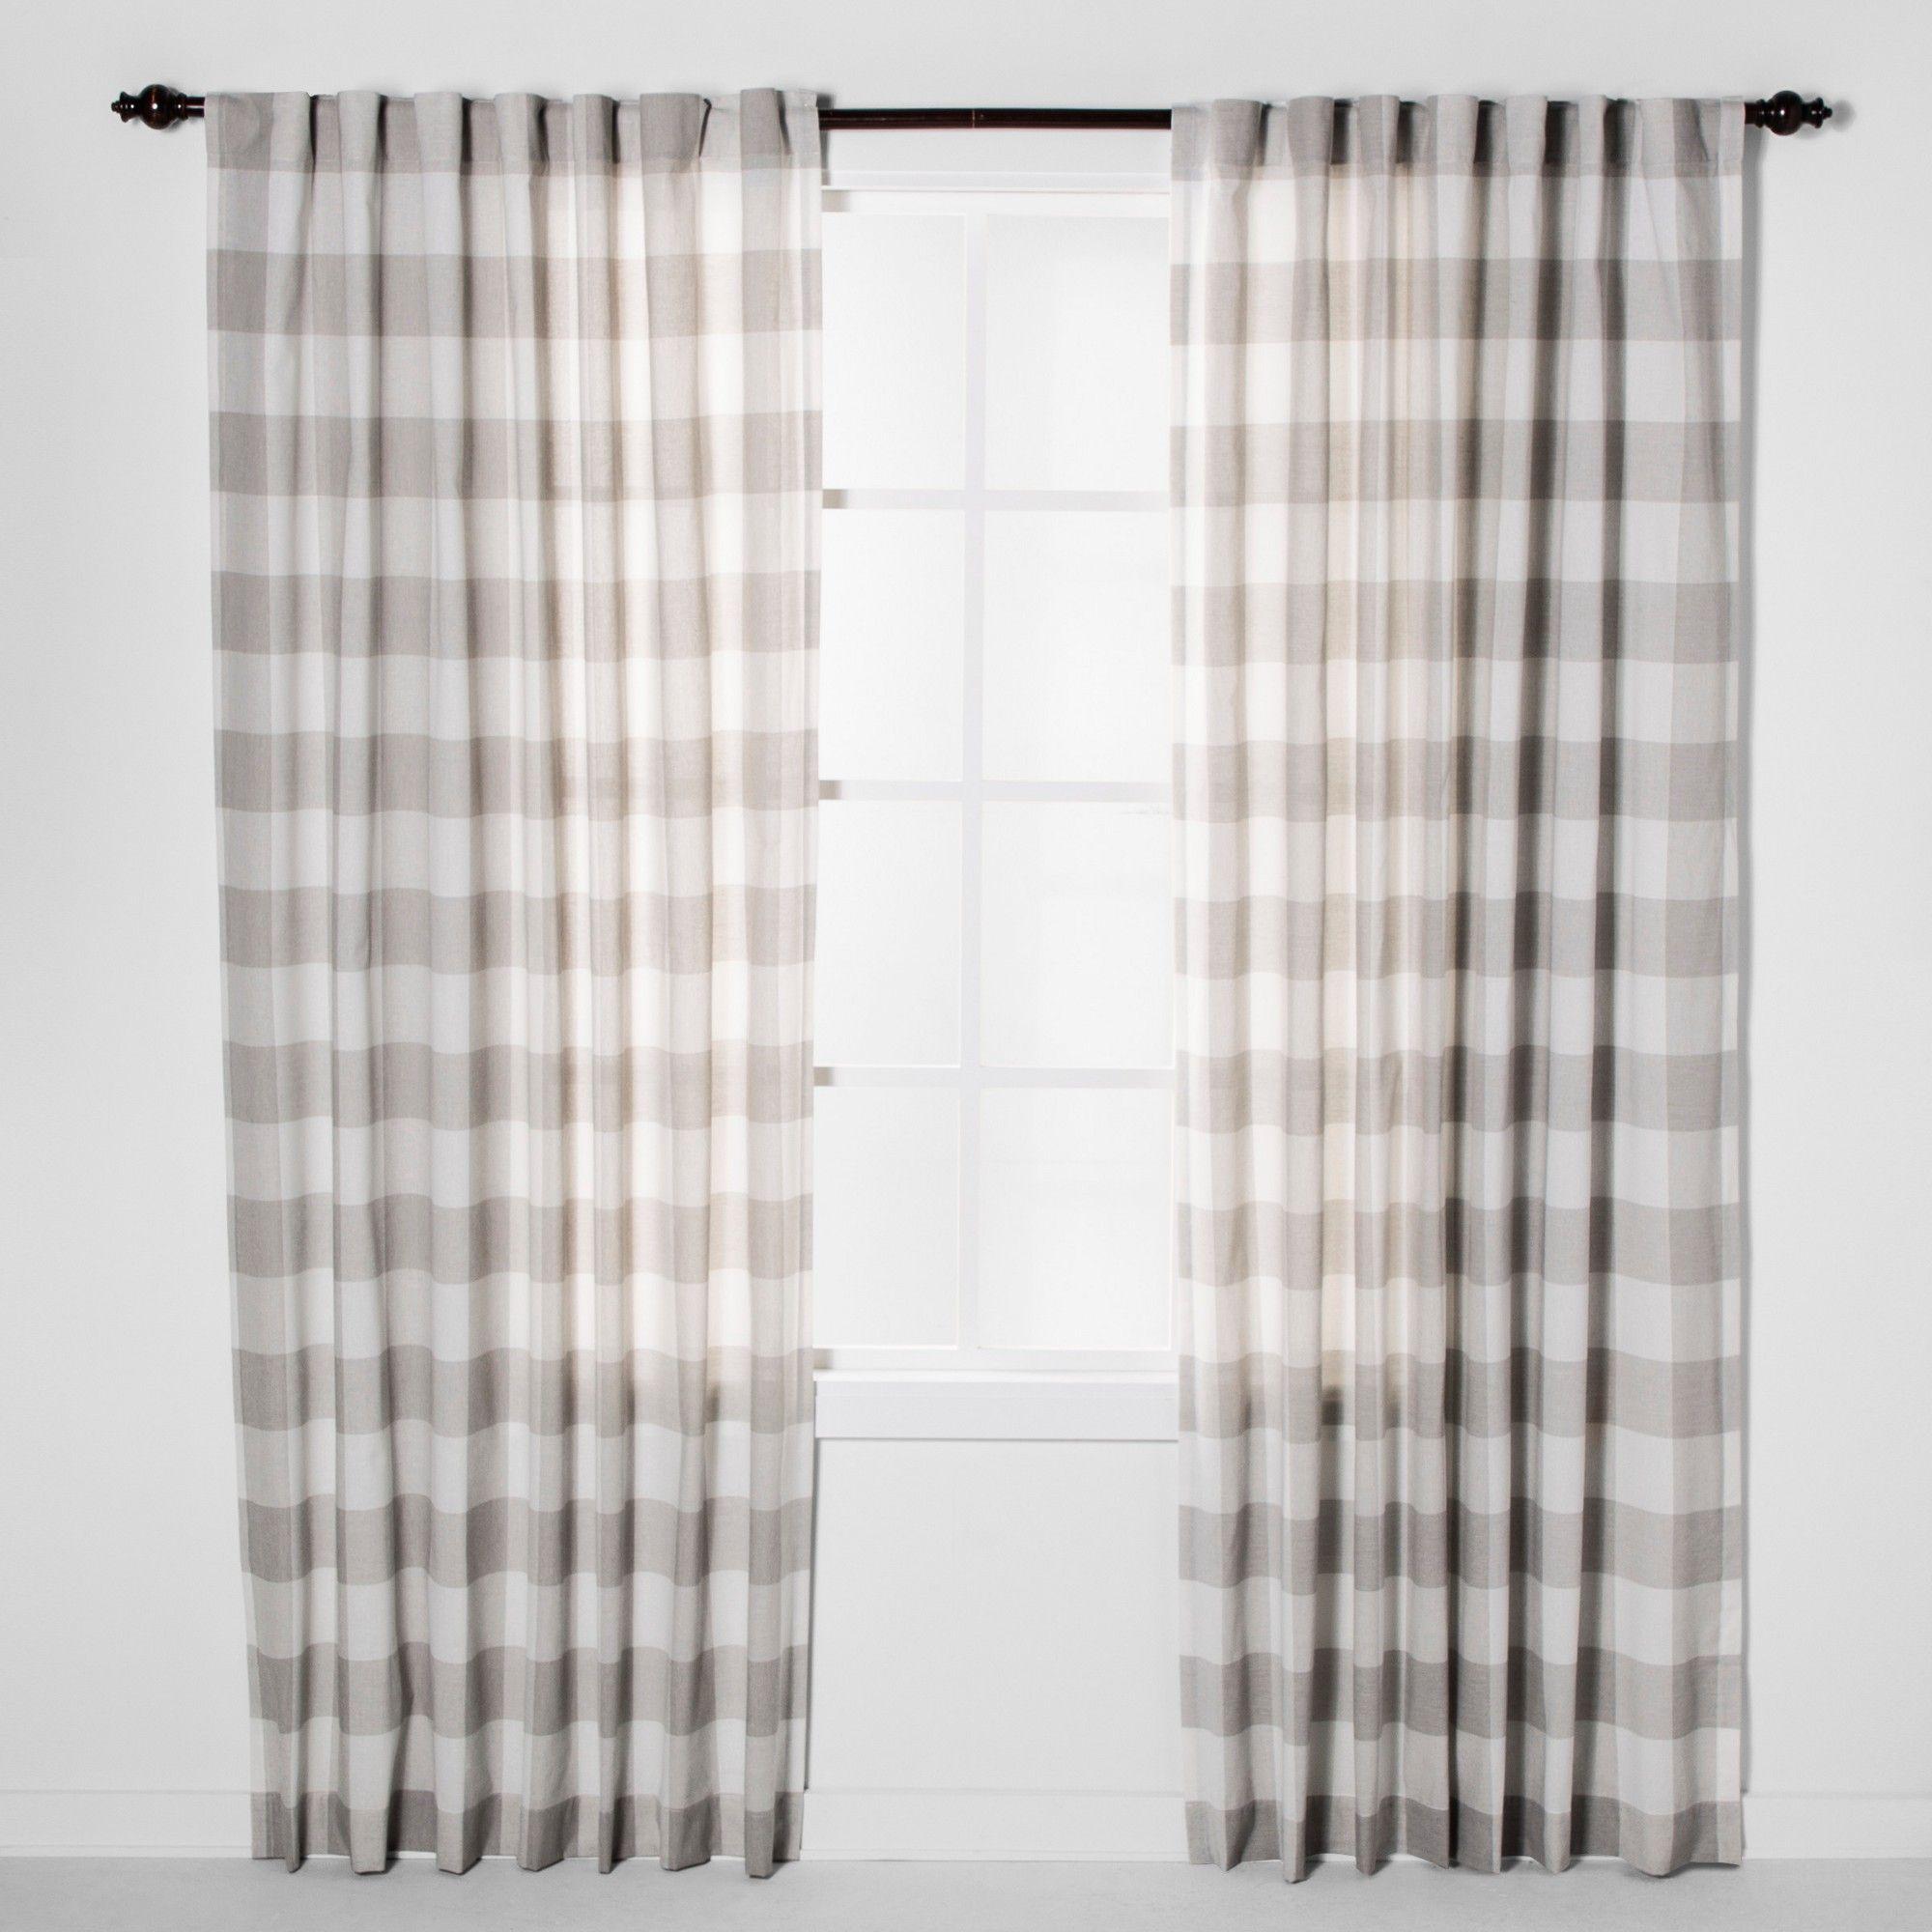 84 X54 Plaid Light Filtering Window Curtain Panel Cream Light Gray Threshold Panel Curtains Living Room Decor Curtains Curtains